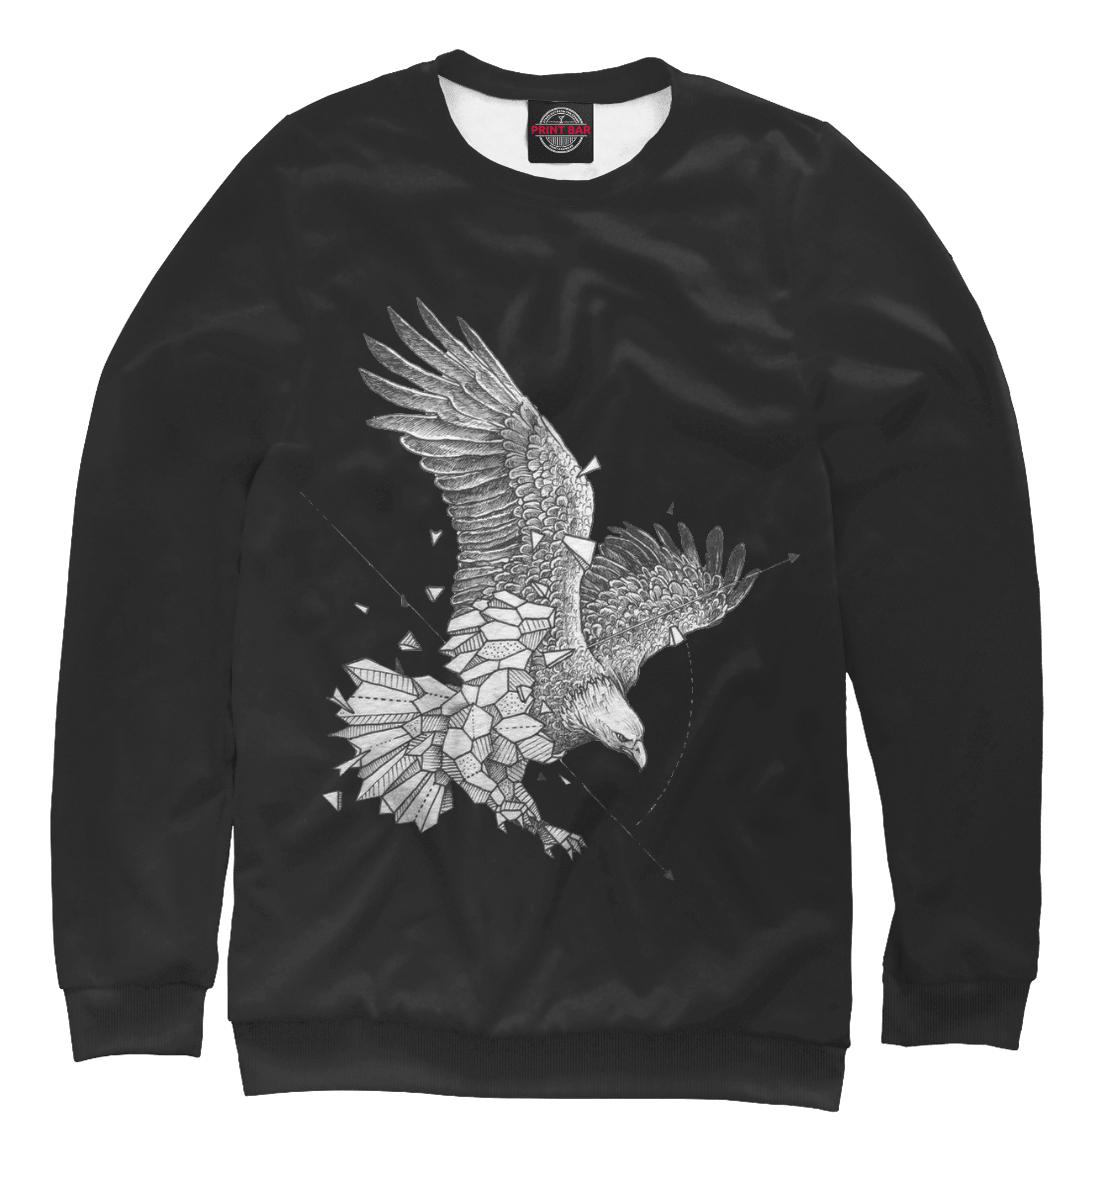 Купить Geometric dark eagle, Printbar, Свитшоты, HIP-658767-swi-1